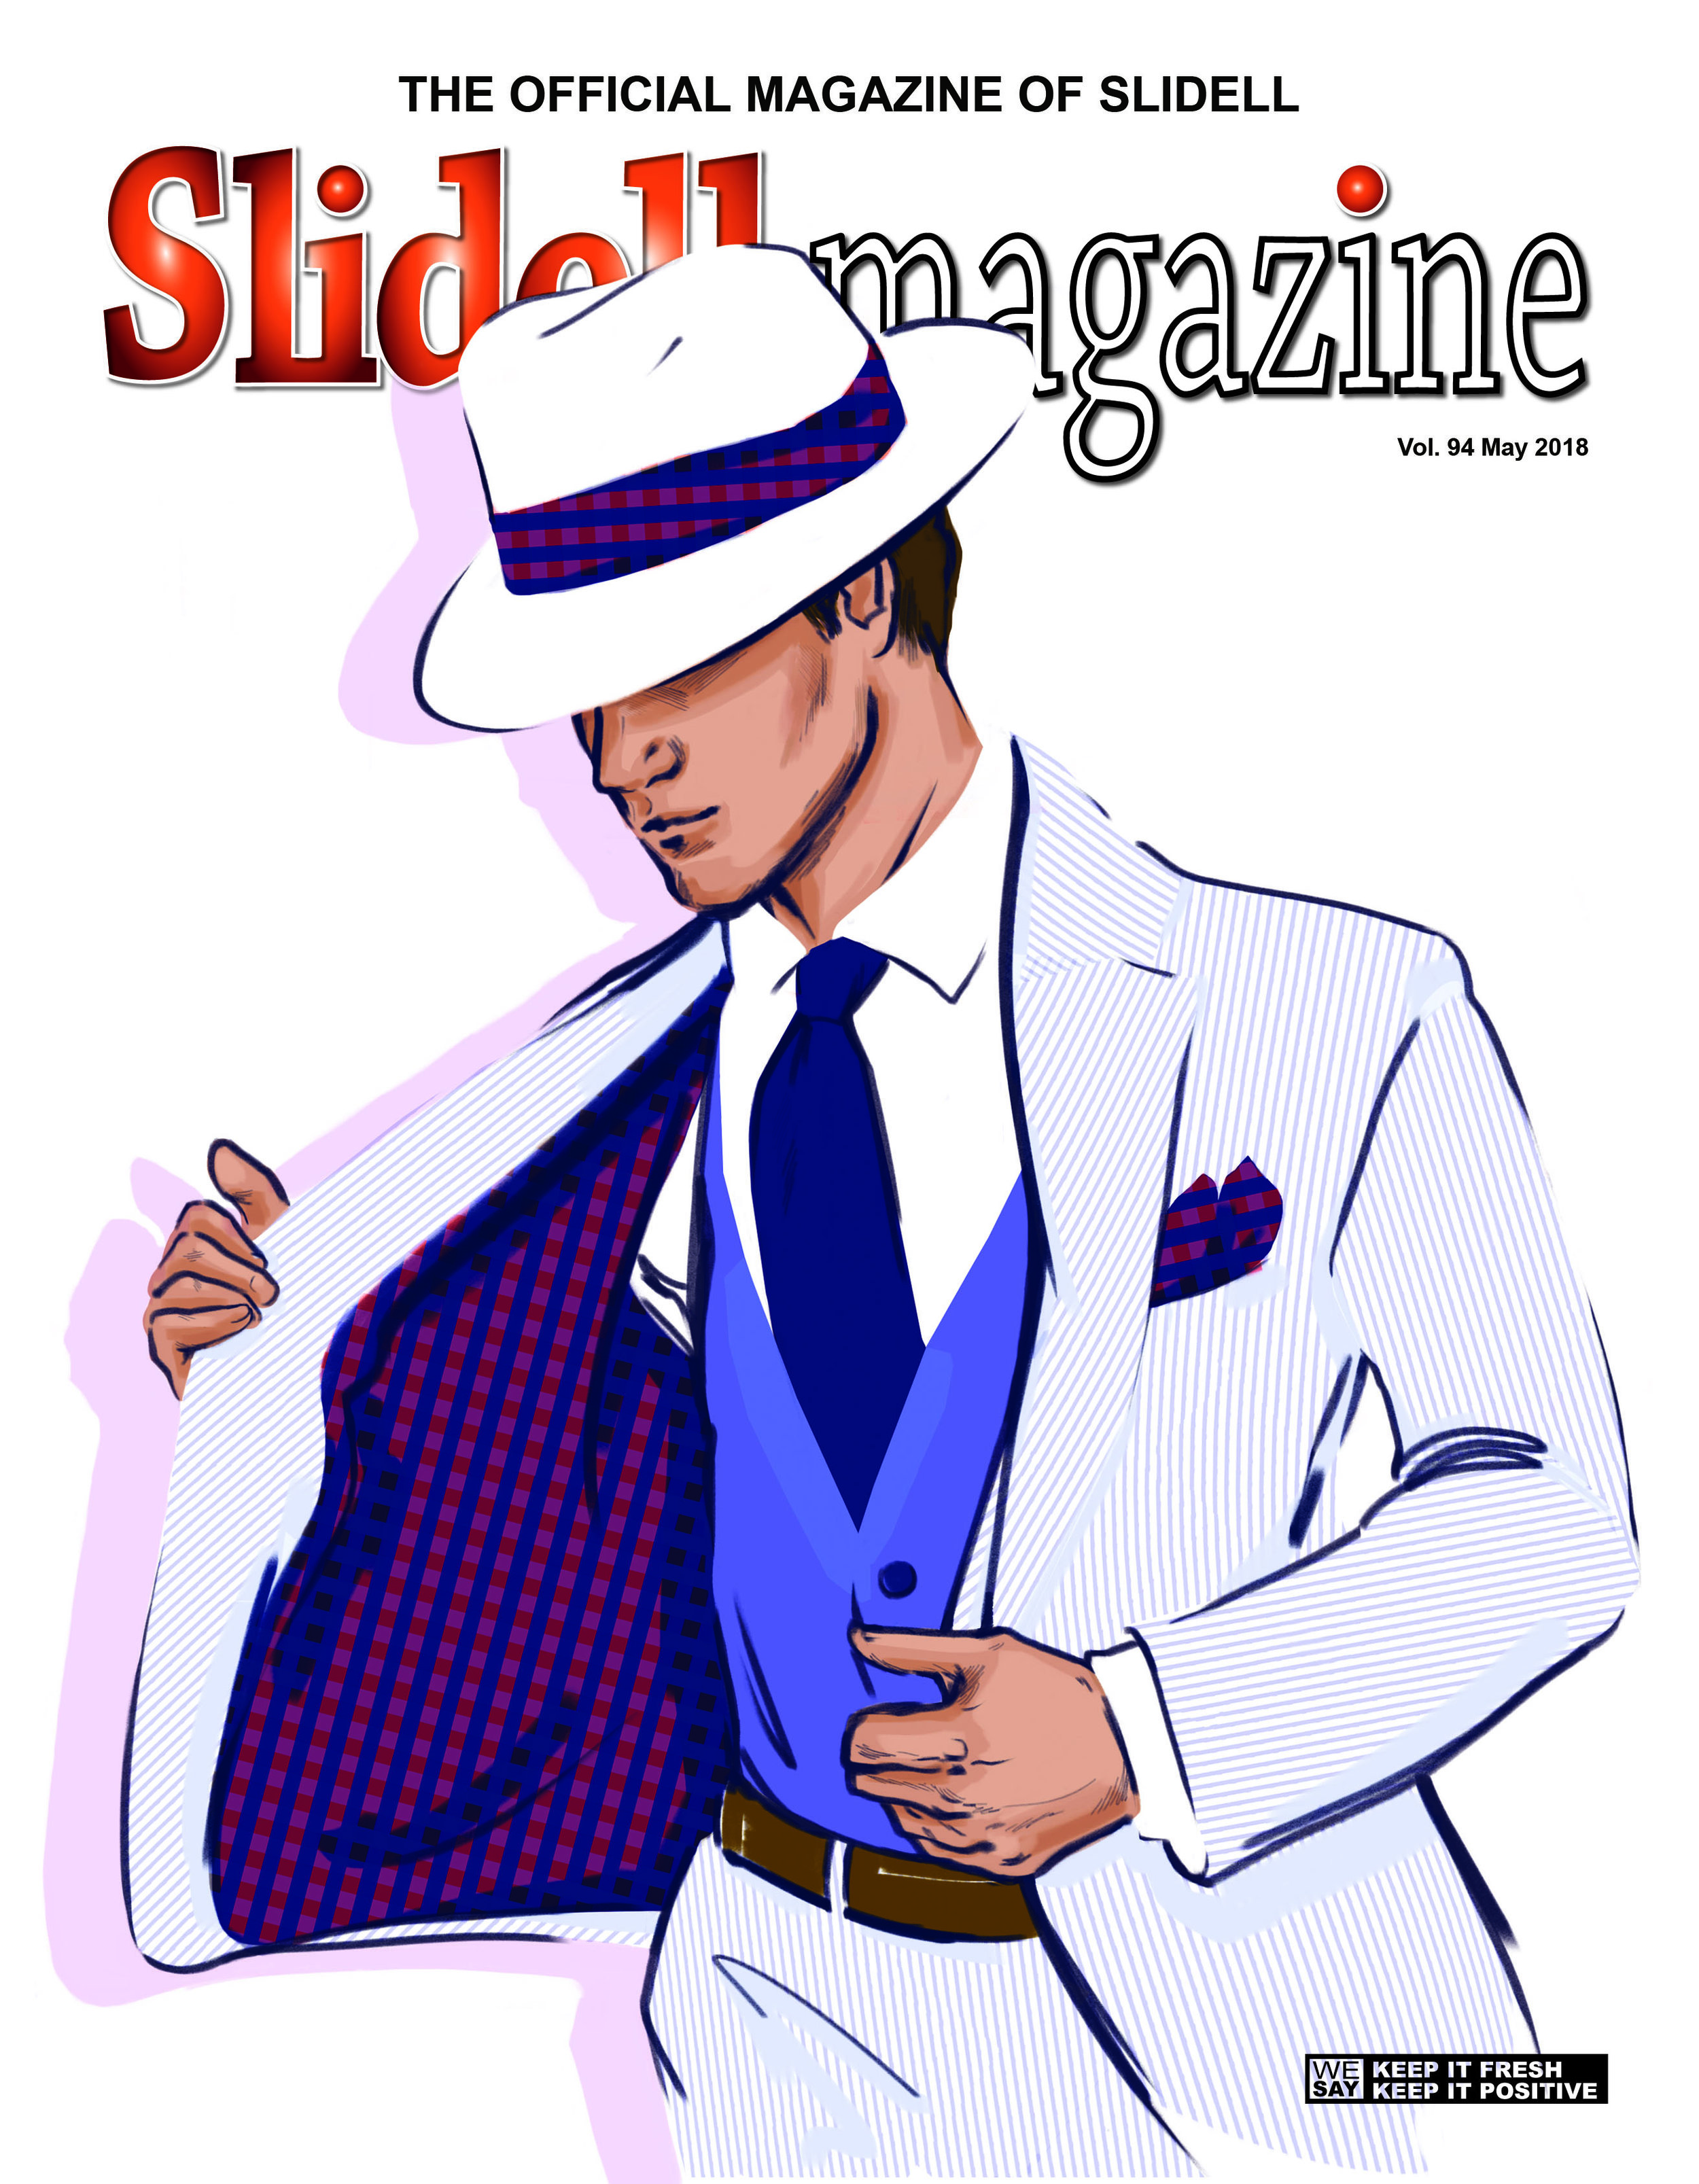 Slidell Magazine, August 2018